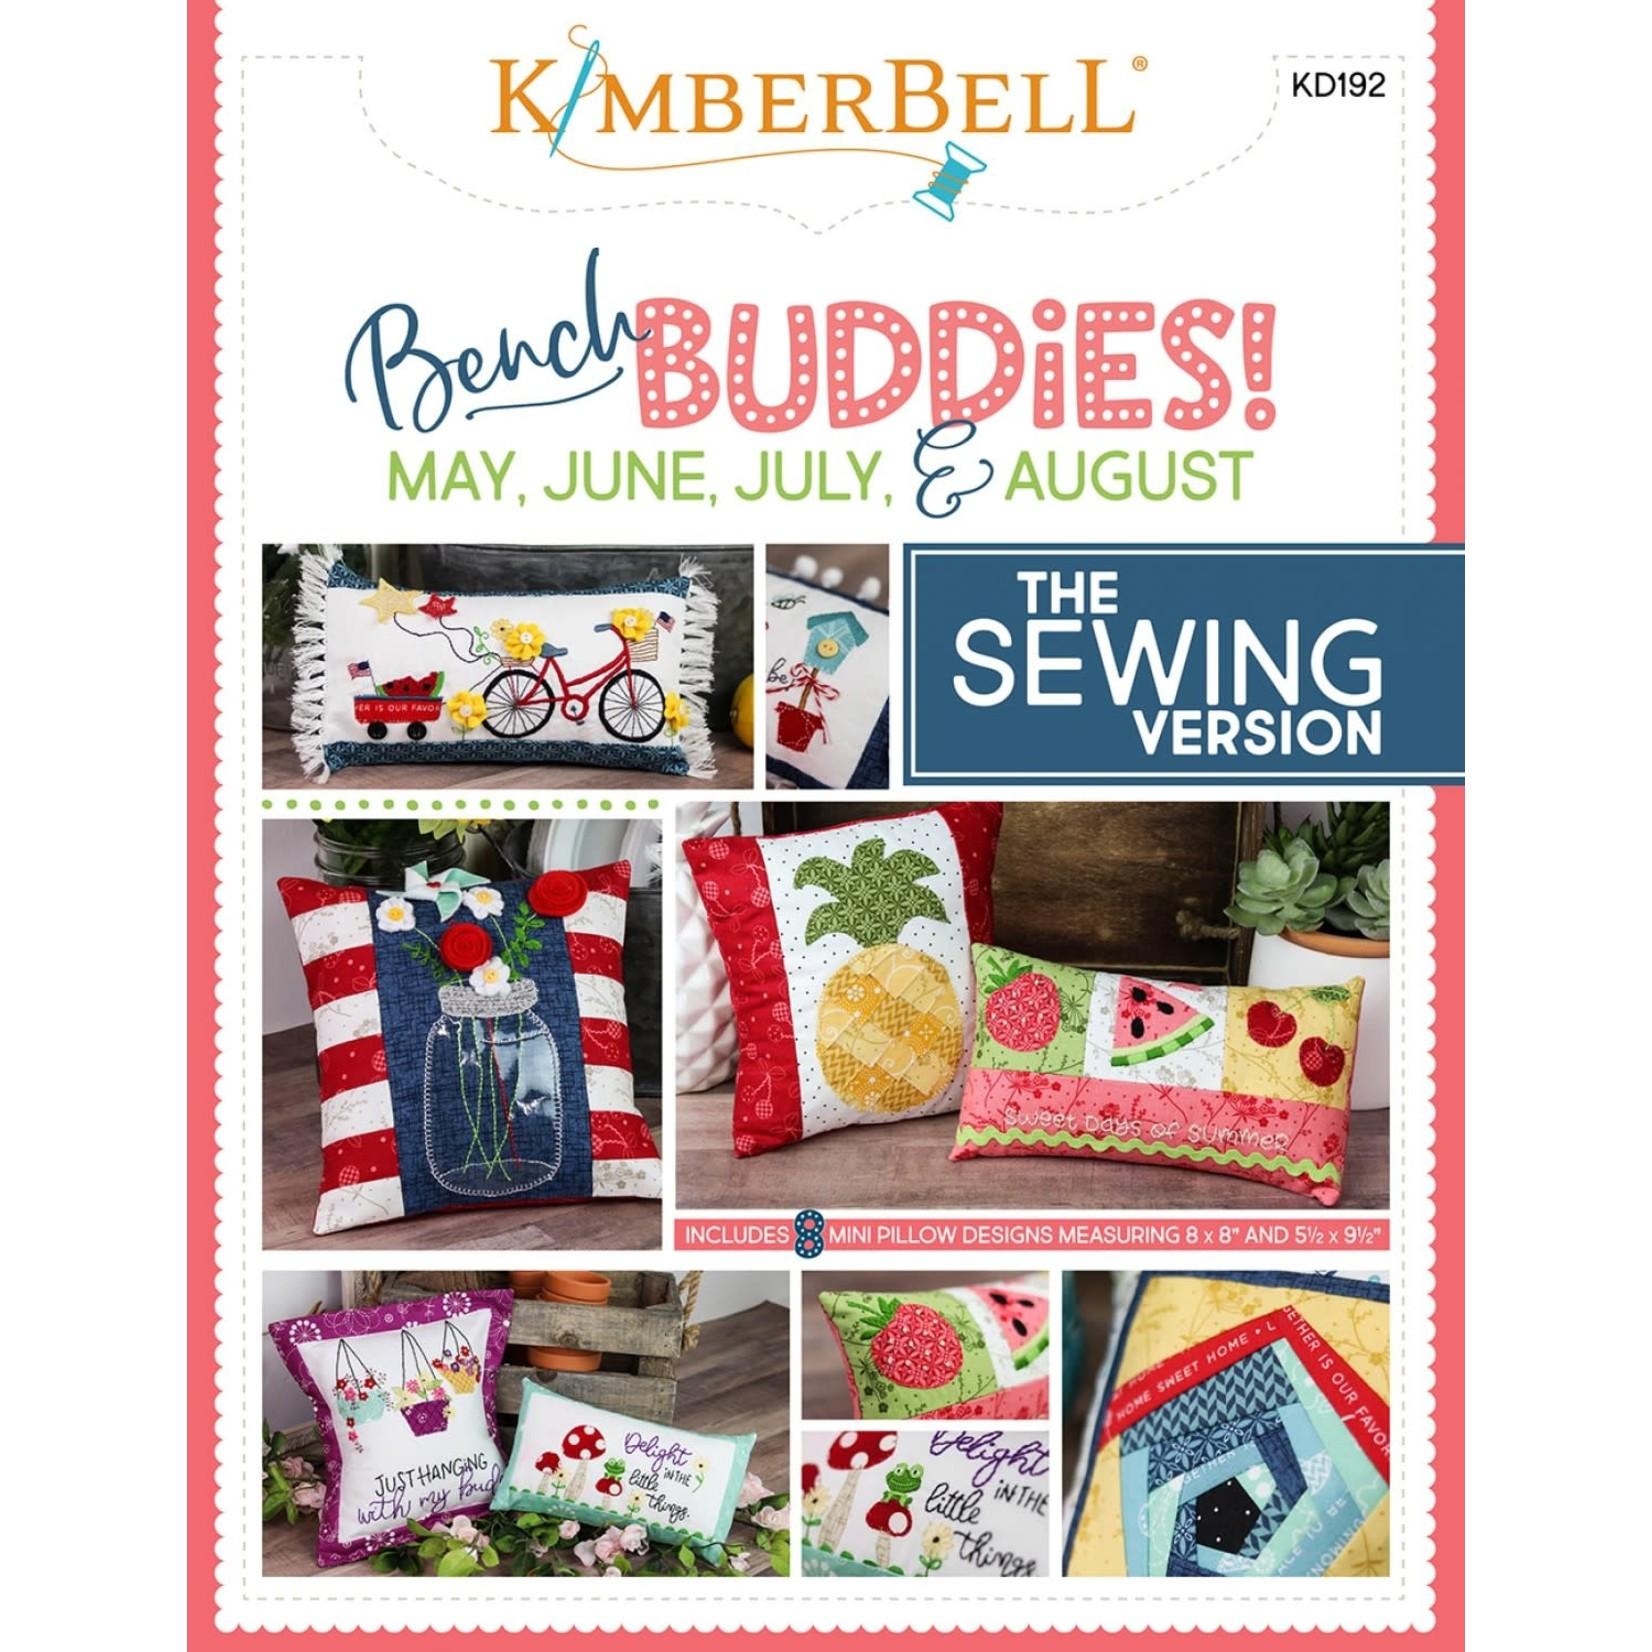 Kimberbell Designs Bench Buddies May, June, Jul, Aug Sewing Version